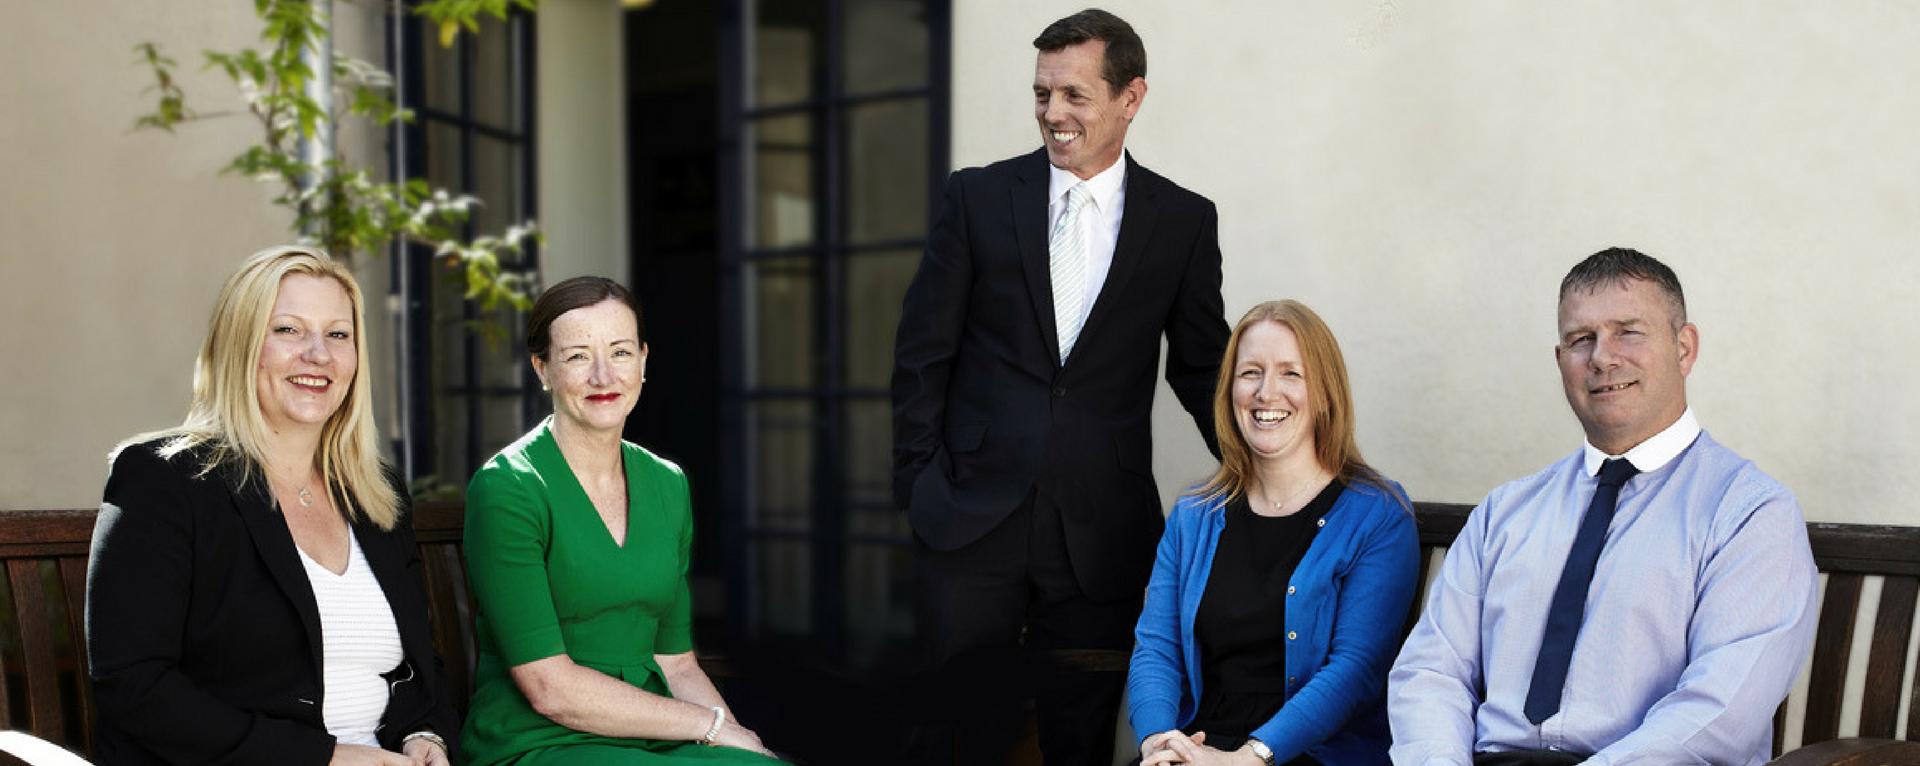 inclusion housing team appoints Sugar PR